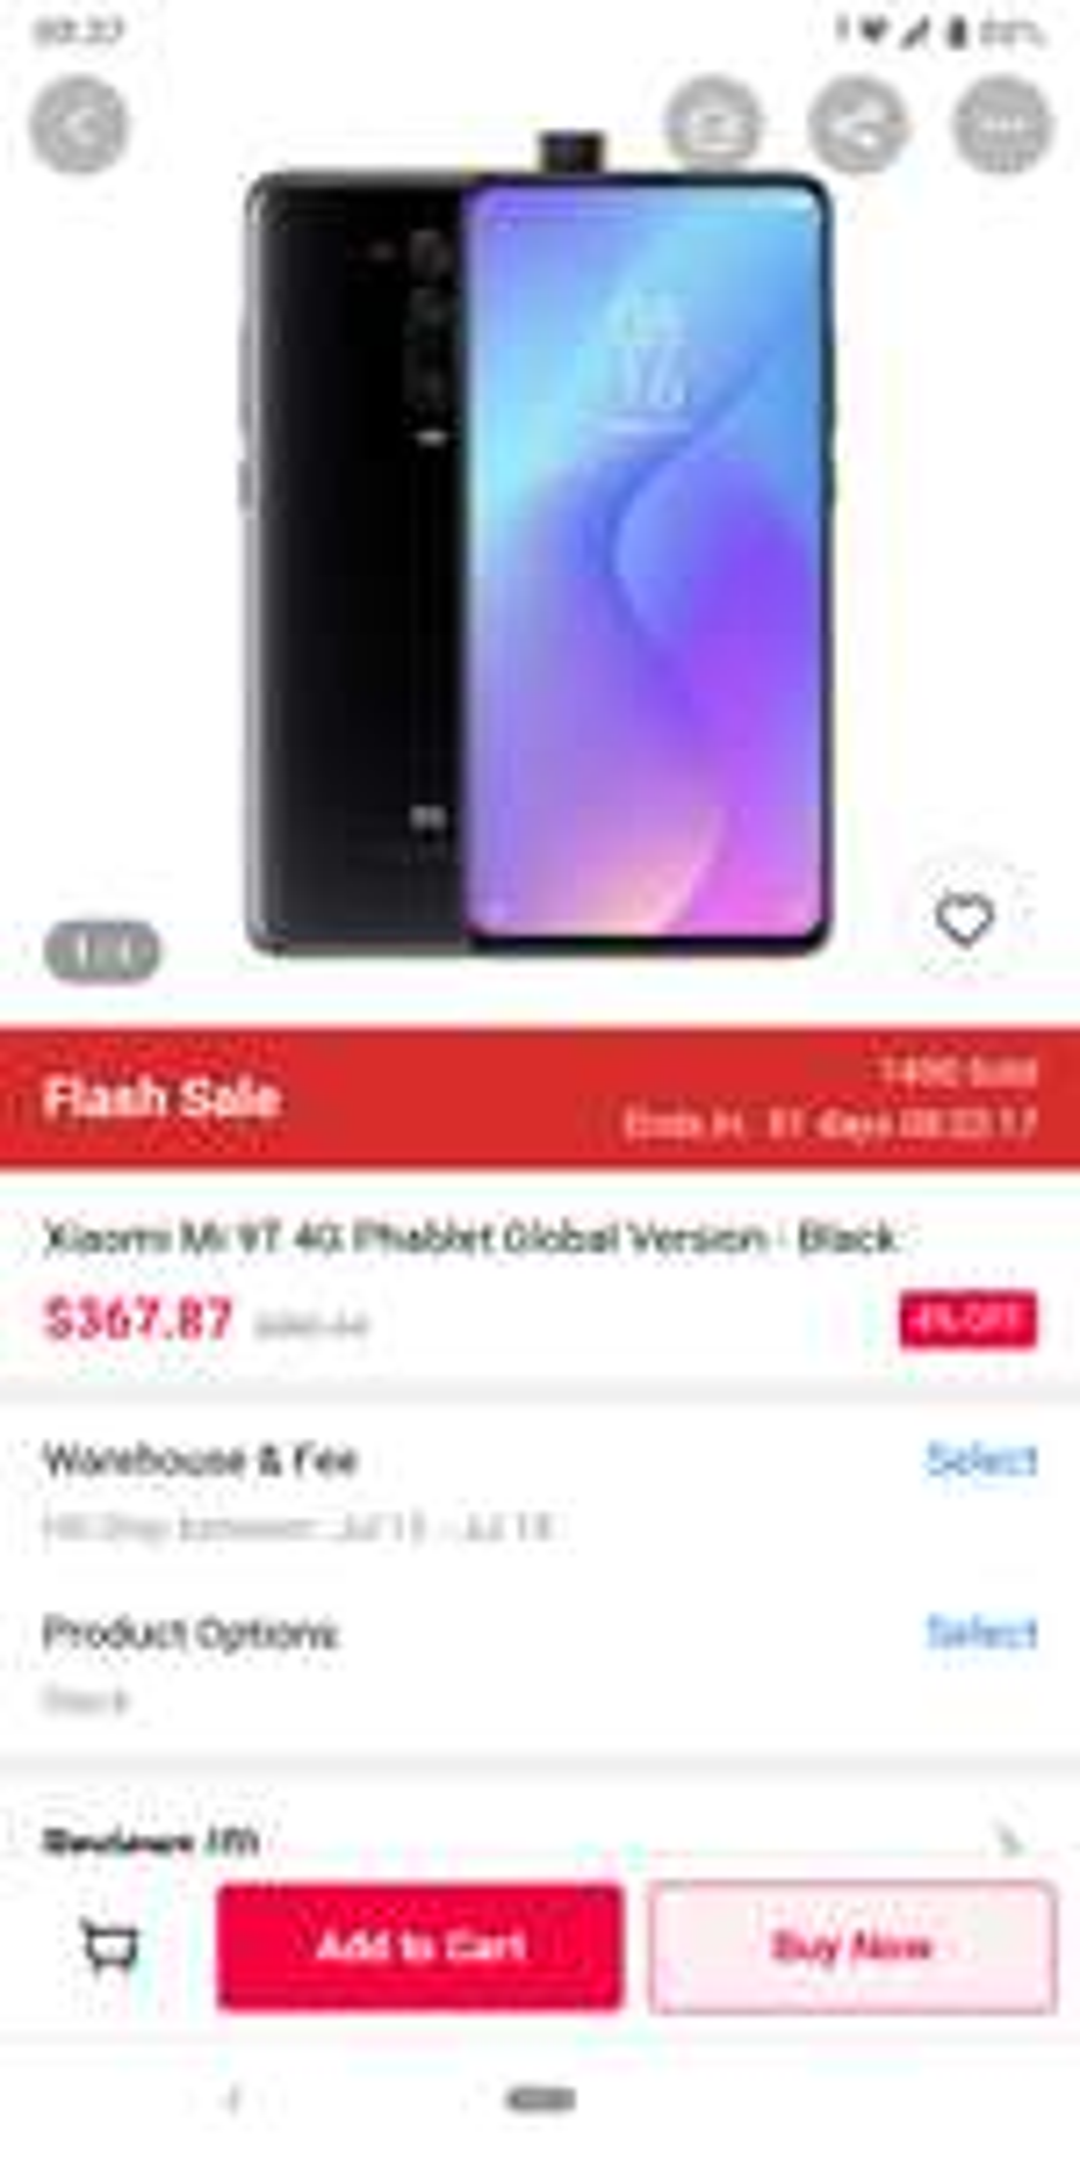 Smartfon Xiaomi Mi 9T (Redmi K20) 6/64 SD730